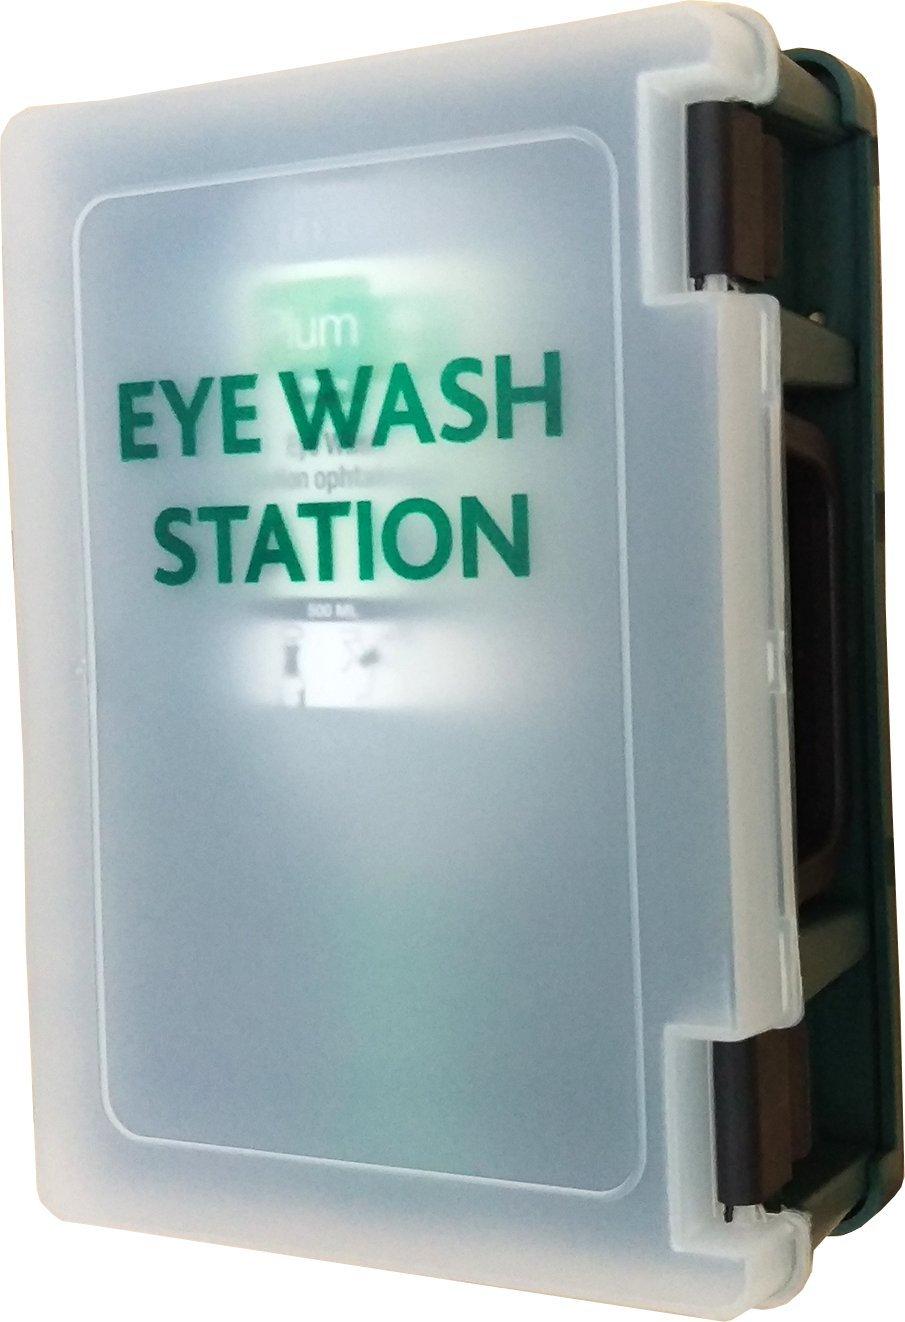 Plum 46506 Single Eyewash Station, 10.5'' Height, 3.75'' Wide, 8.75'' Length, 16.9 fl. oz, Plastic by Plum